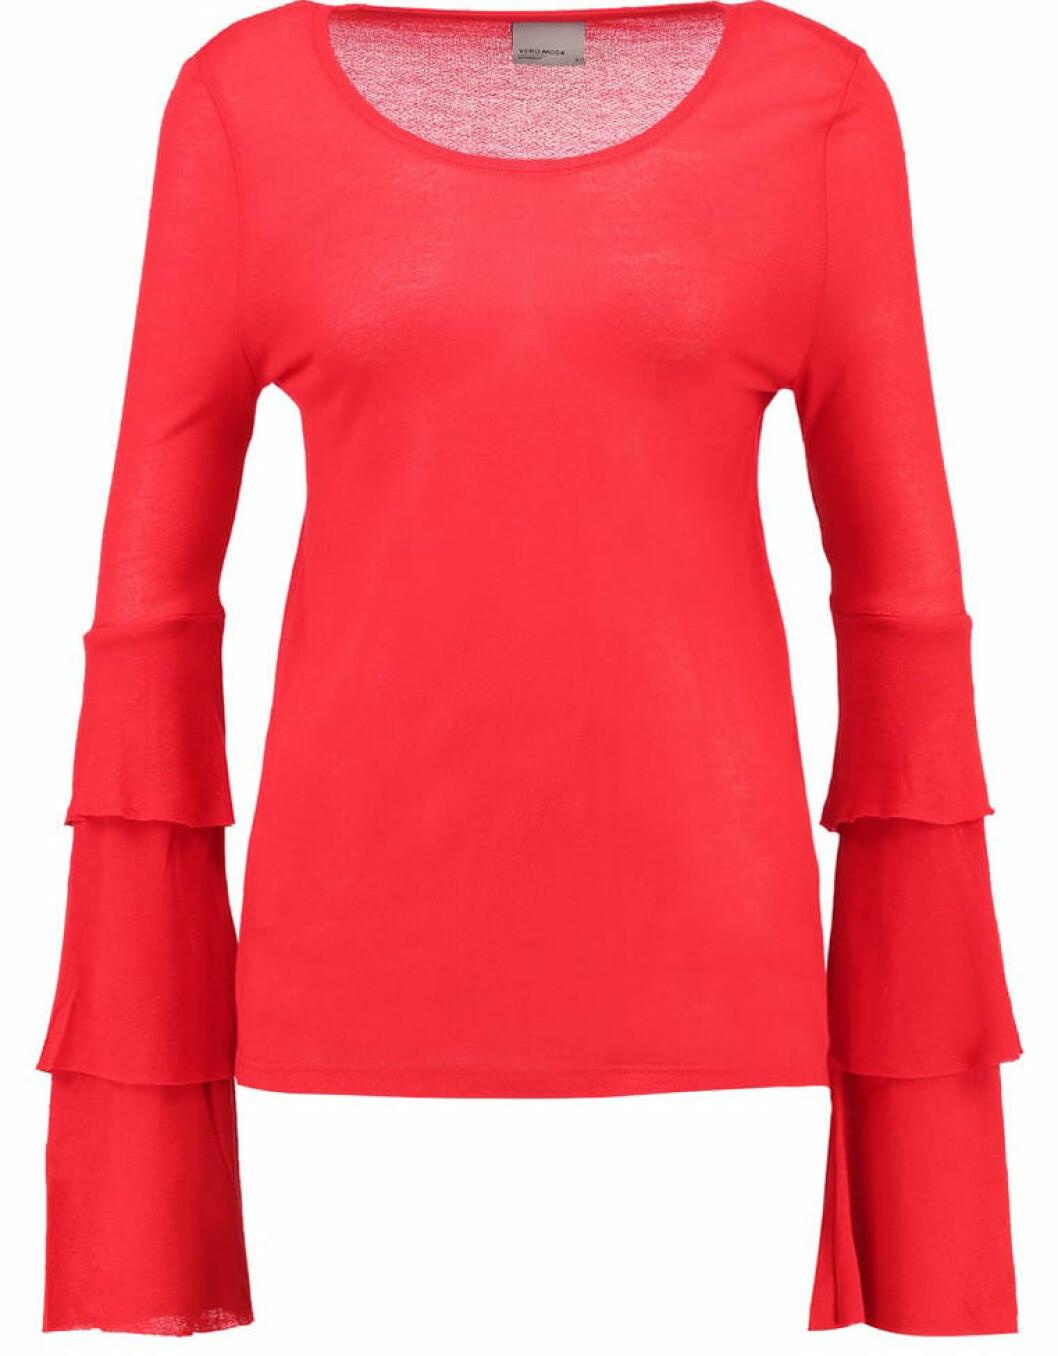 röd tröja volanger